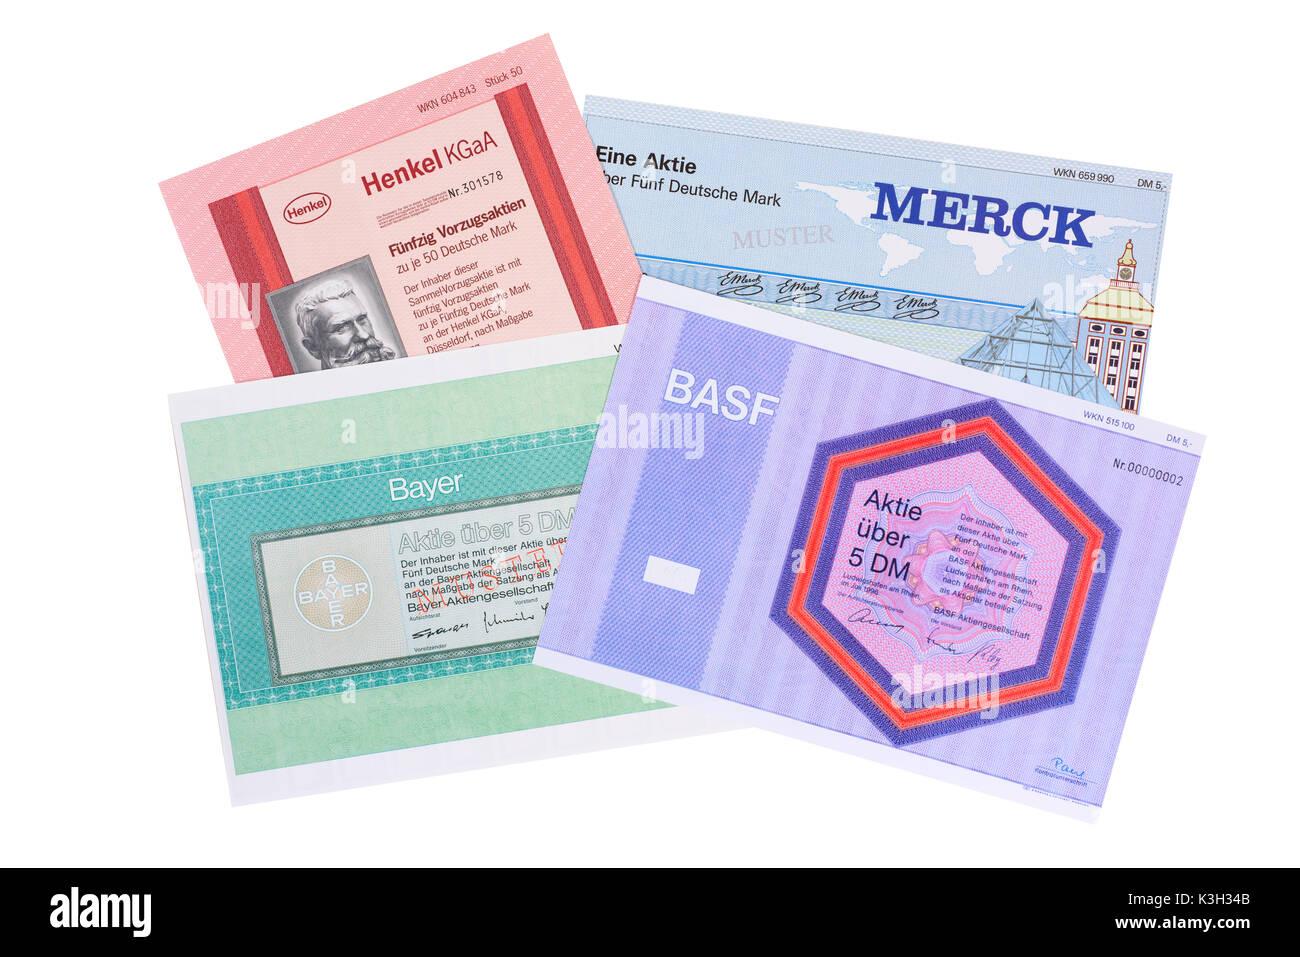 Stocks of the companys Henkel, Merck, Bayer, BASF Stock